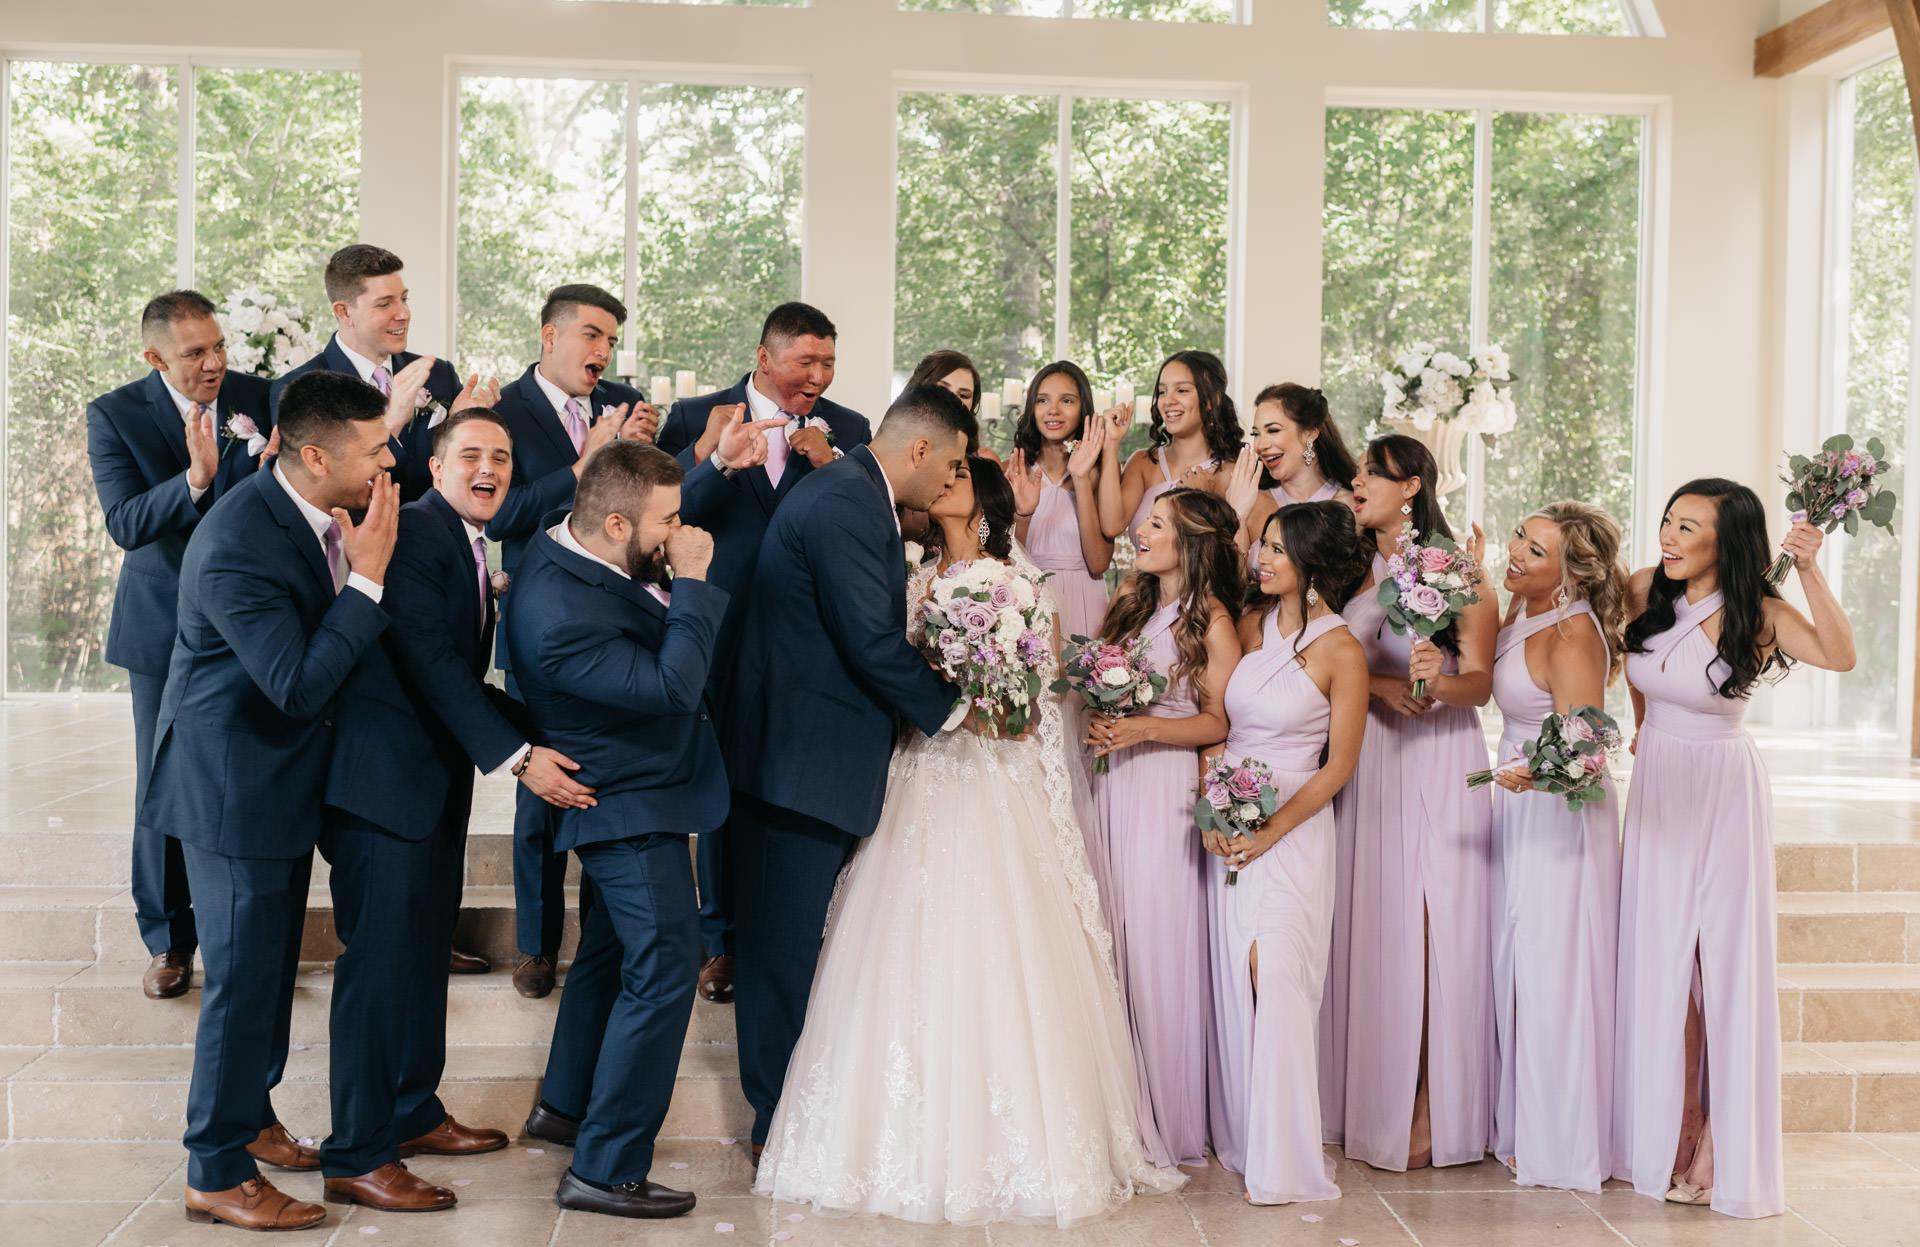 lexi-michael-wedding-blog-sm-65.jpg